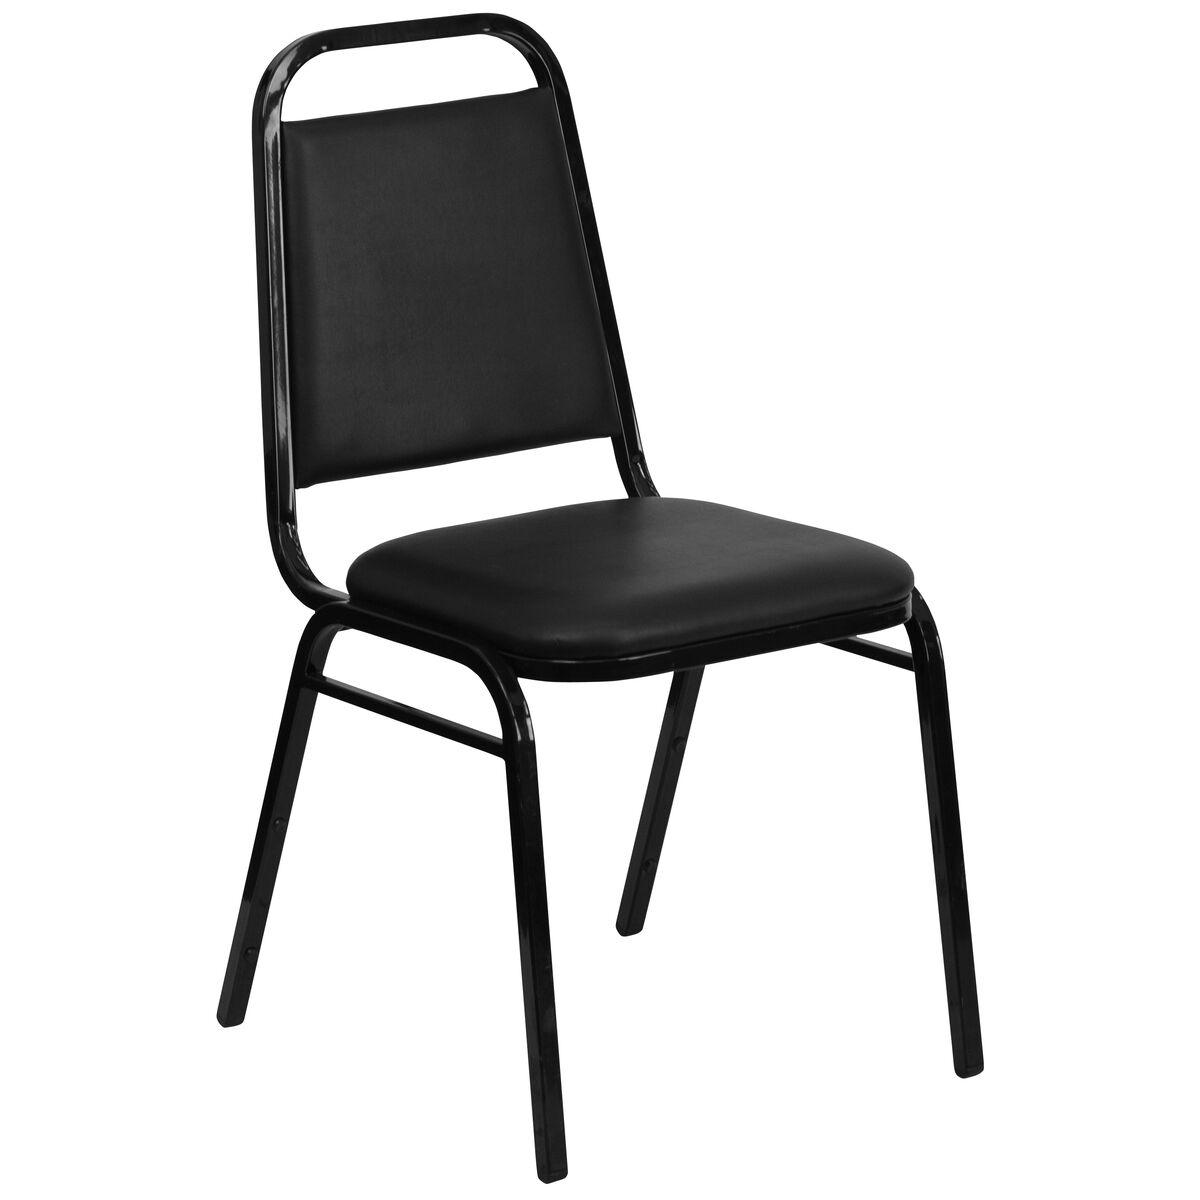 black vinyl banquet chair fd bhf 2 gg stackchairs4less com